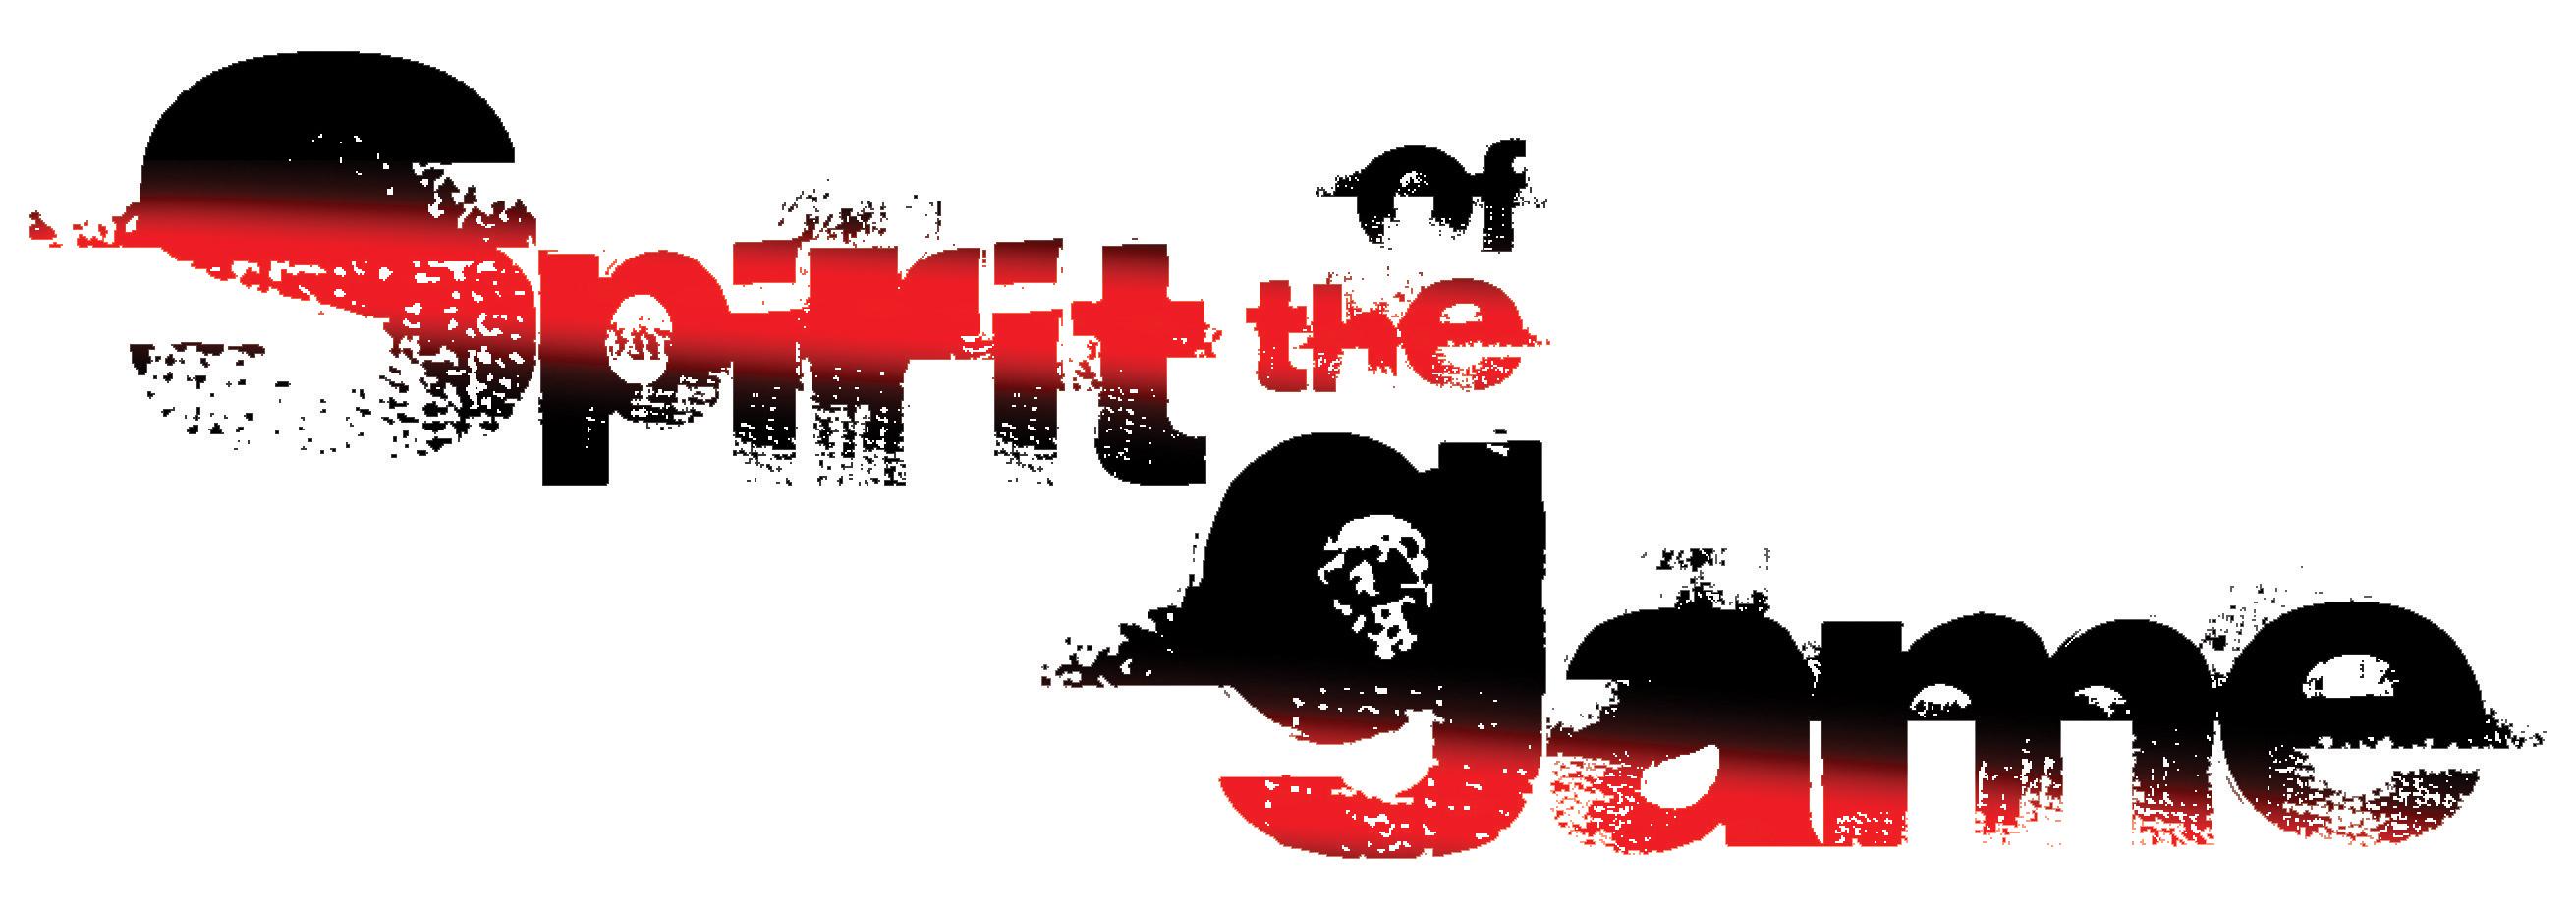 Spirit_logo.jpg